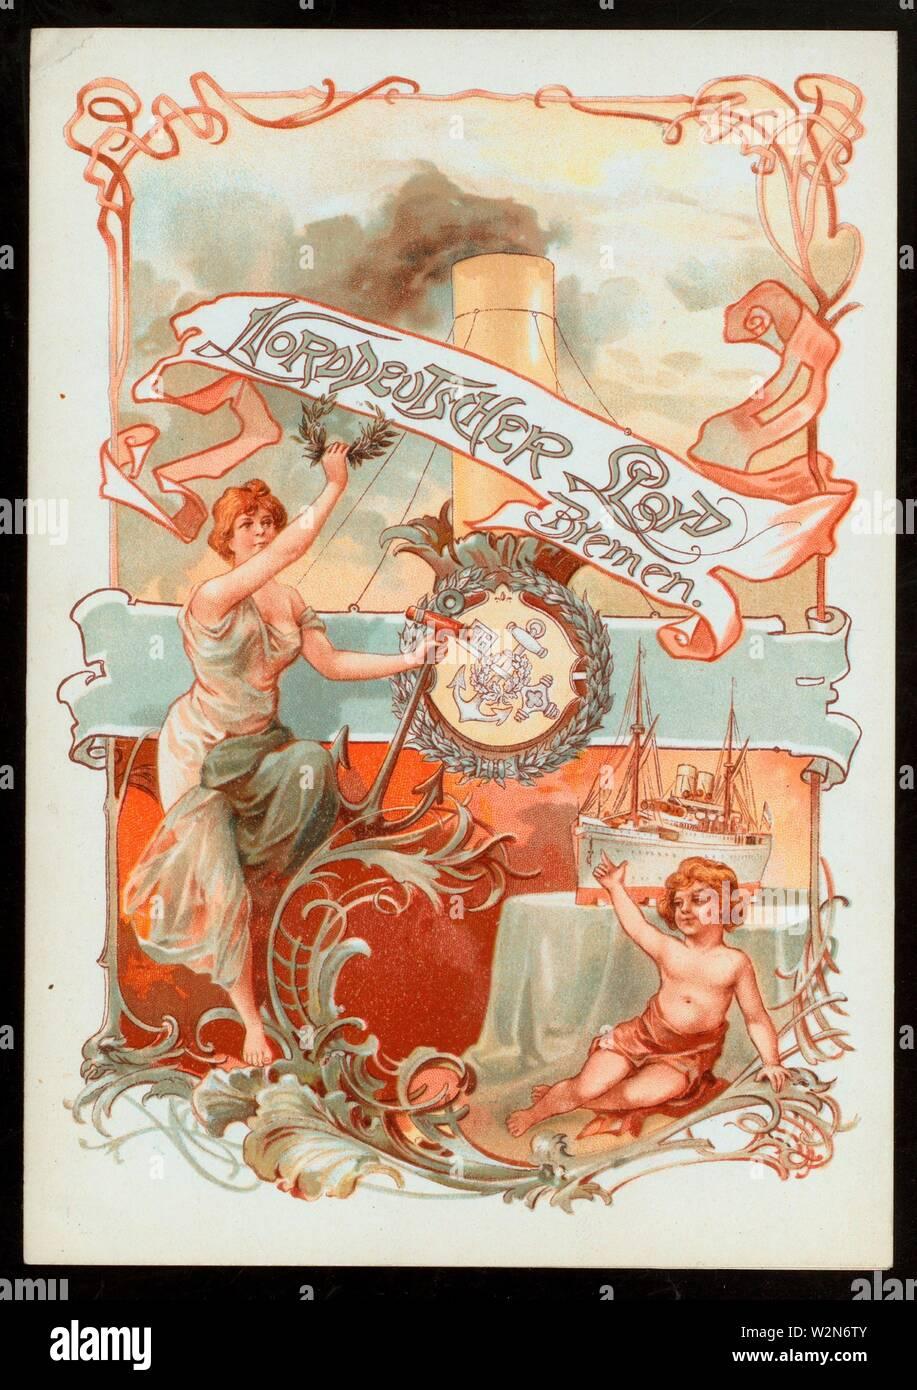 DINNER [held by] NORDDEUTSCHER LLOYD BREMEN [at] ''SS ''FRIEDRICH DER GROSSE'''' (SS;). Buttolph, Frank E., Miss (d. 1924) (Collector). The Buttolph - Stock Image